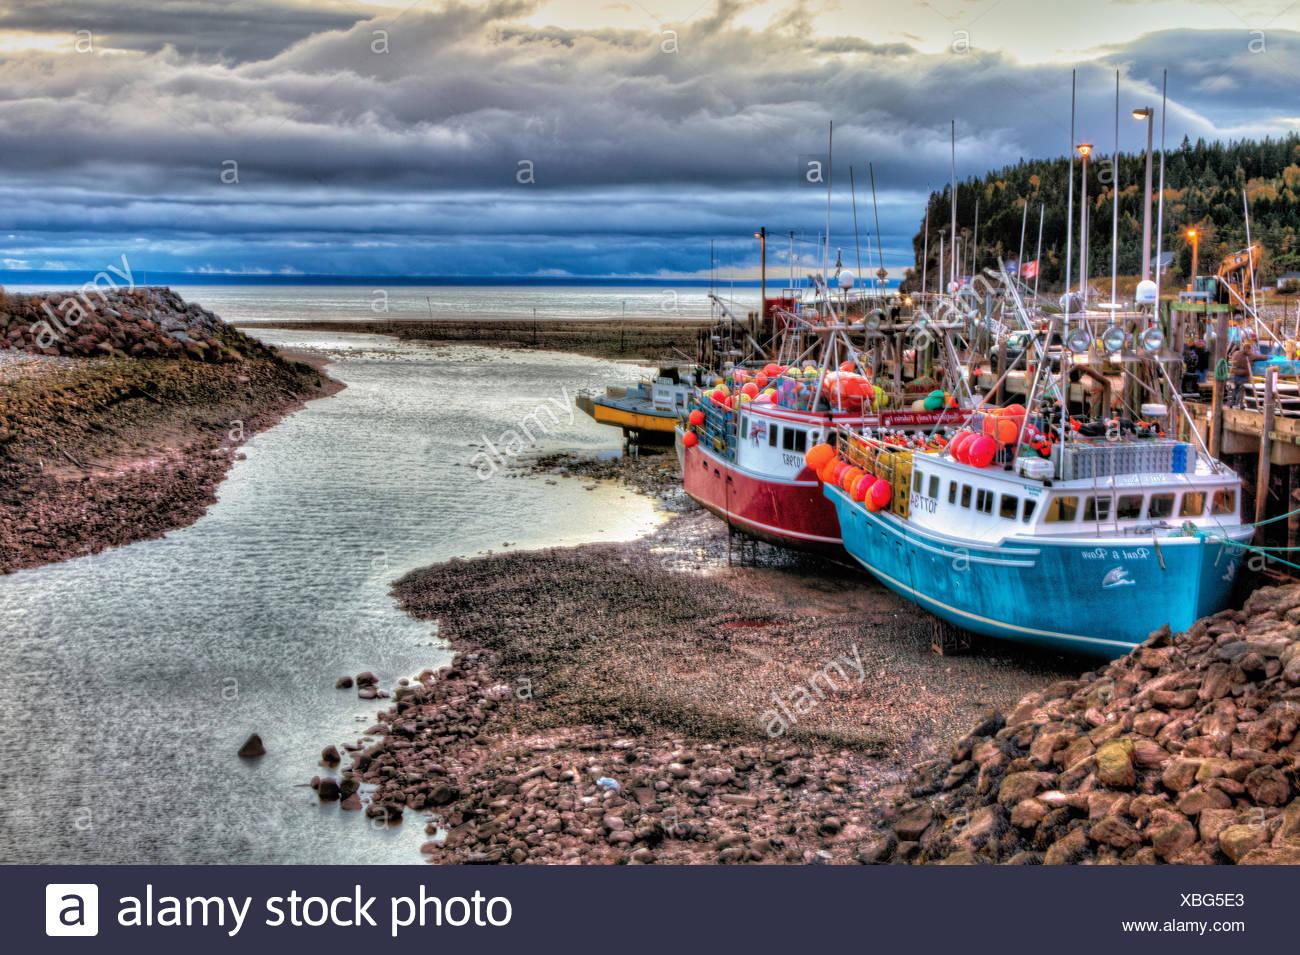 Fishing boats at low tide, Bay of Fundy, Alma, New Brunswick